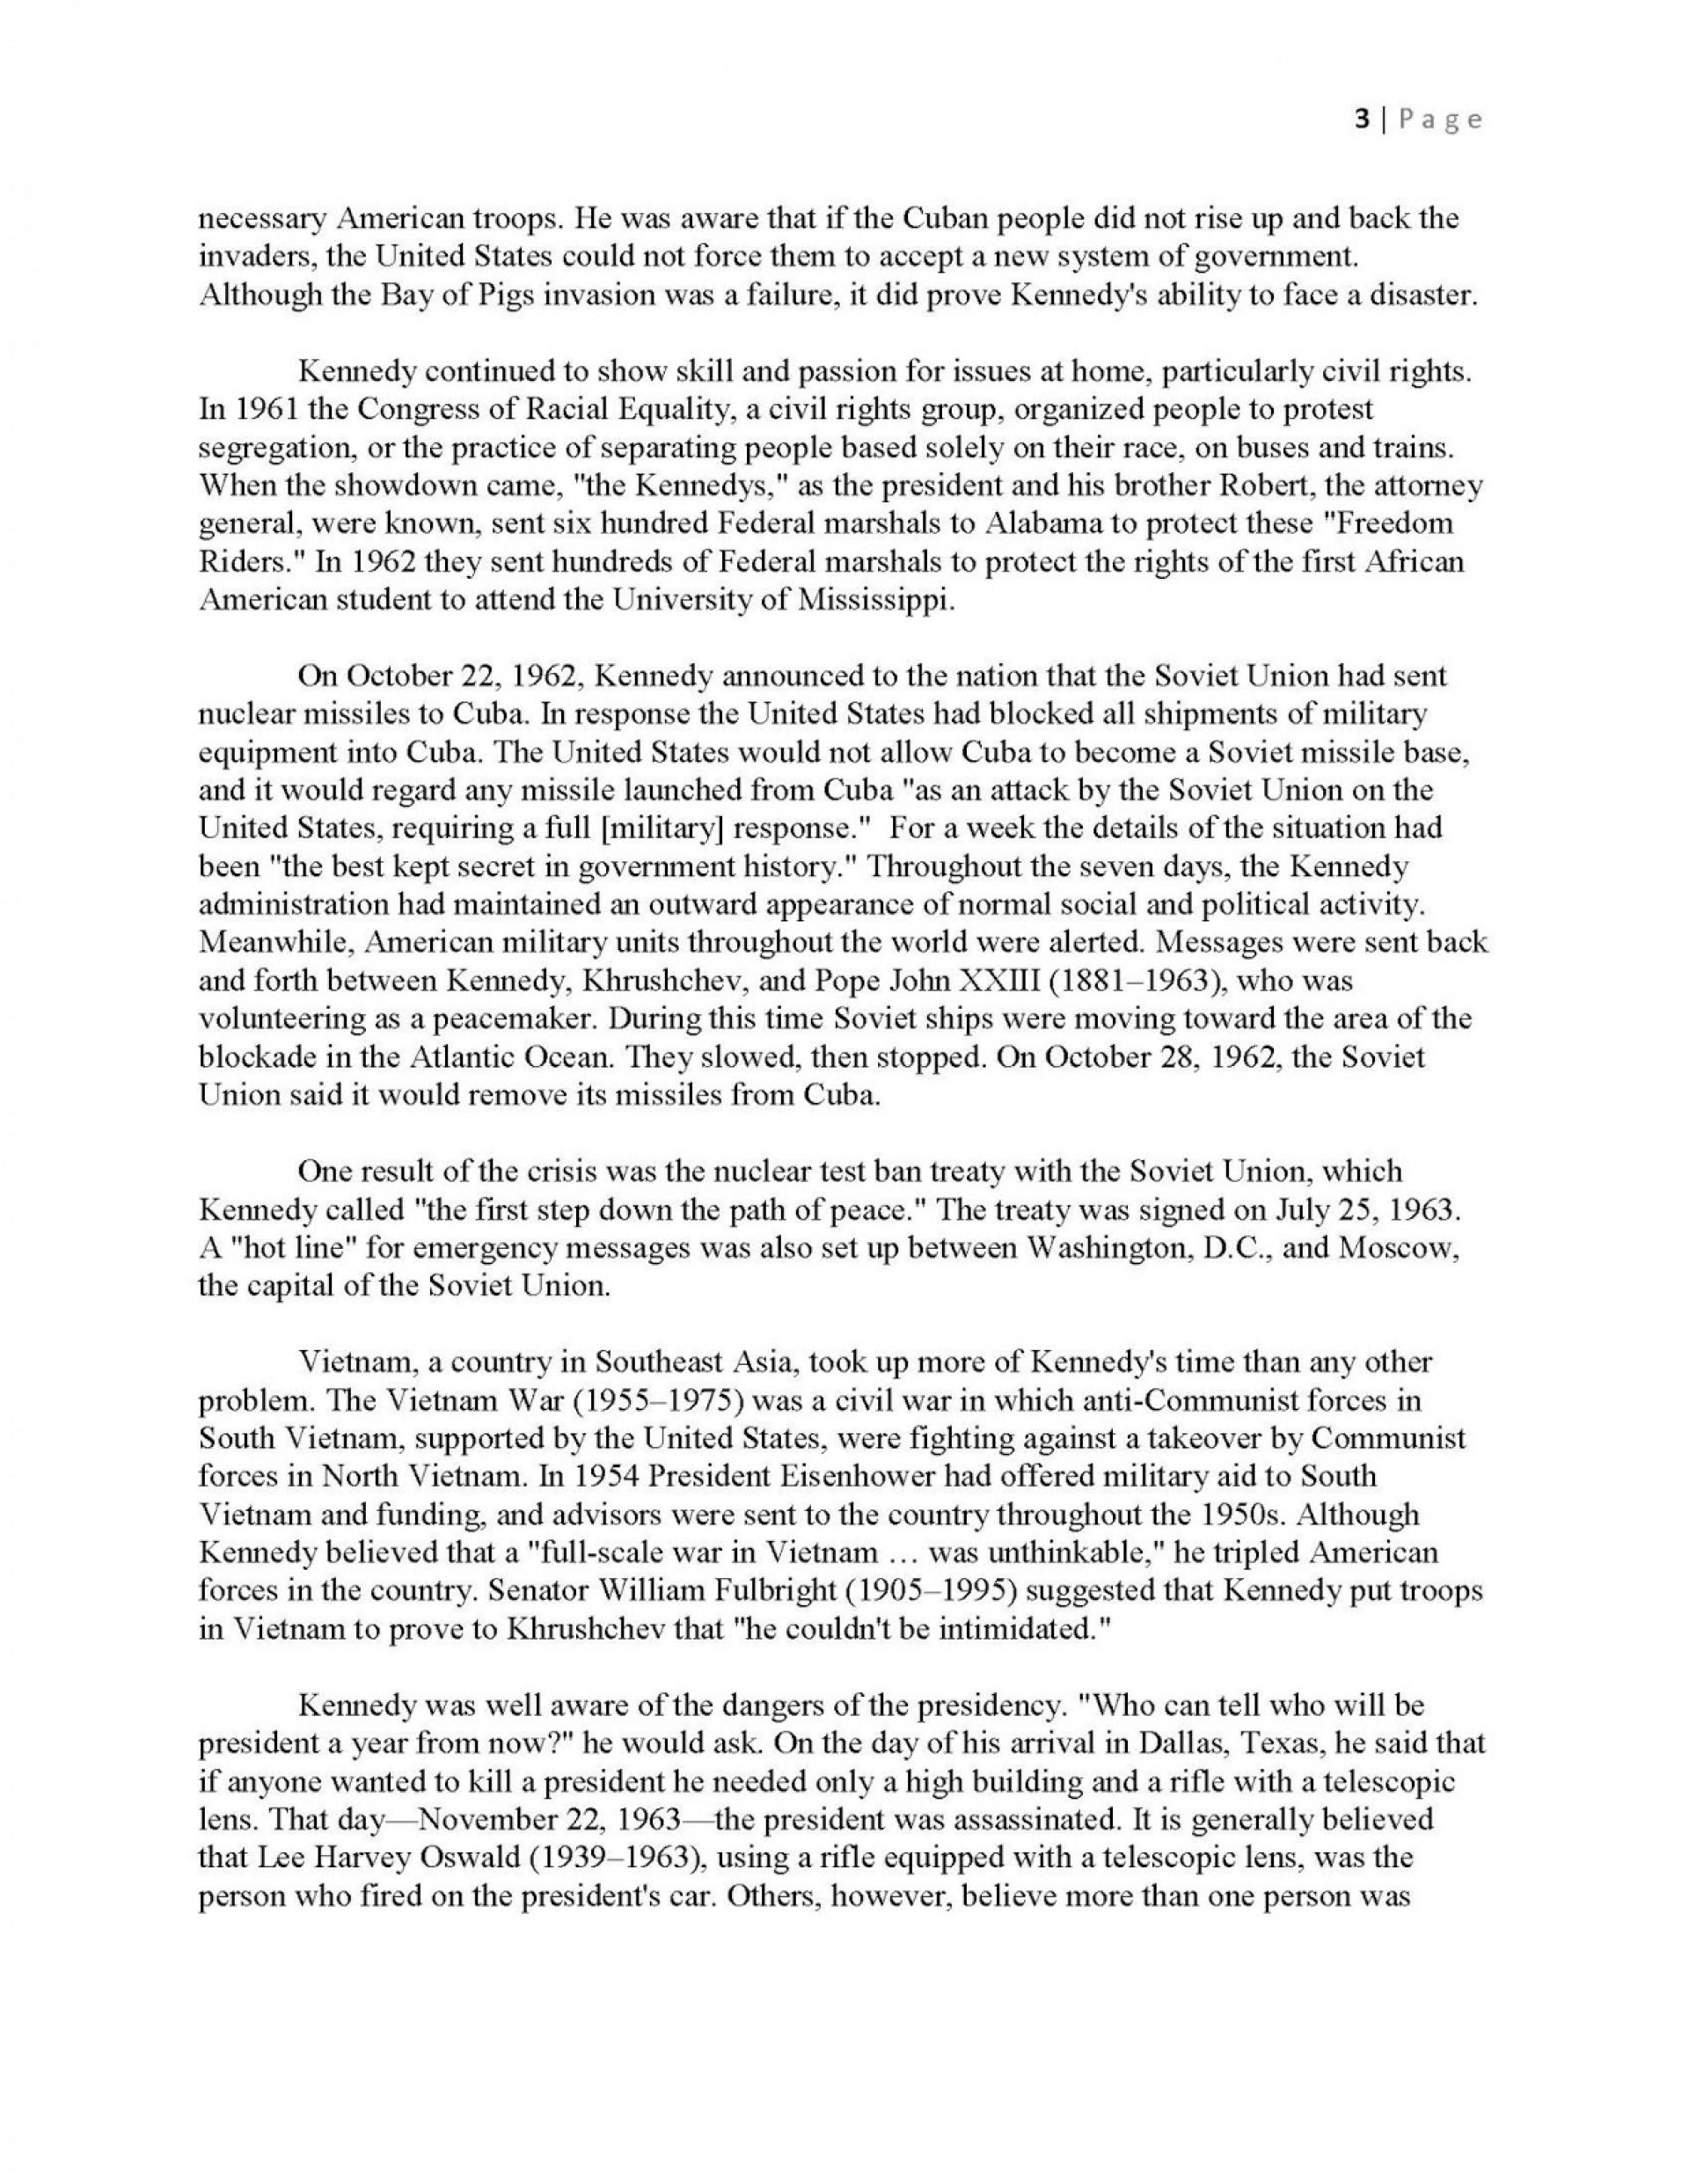 015 Essay Example Jfkmlashortformbiographyreportexample Page 3 College Format Wonderful Mla Research Paper Examples 1920